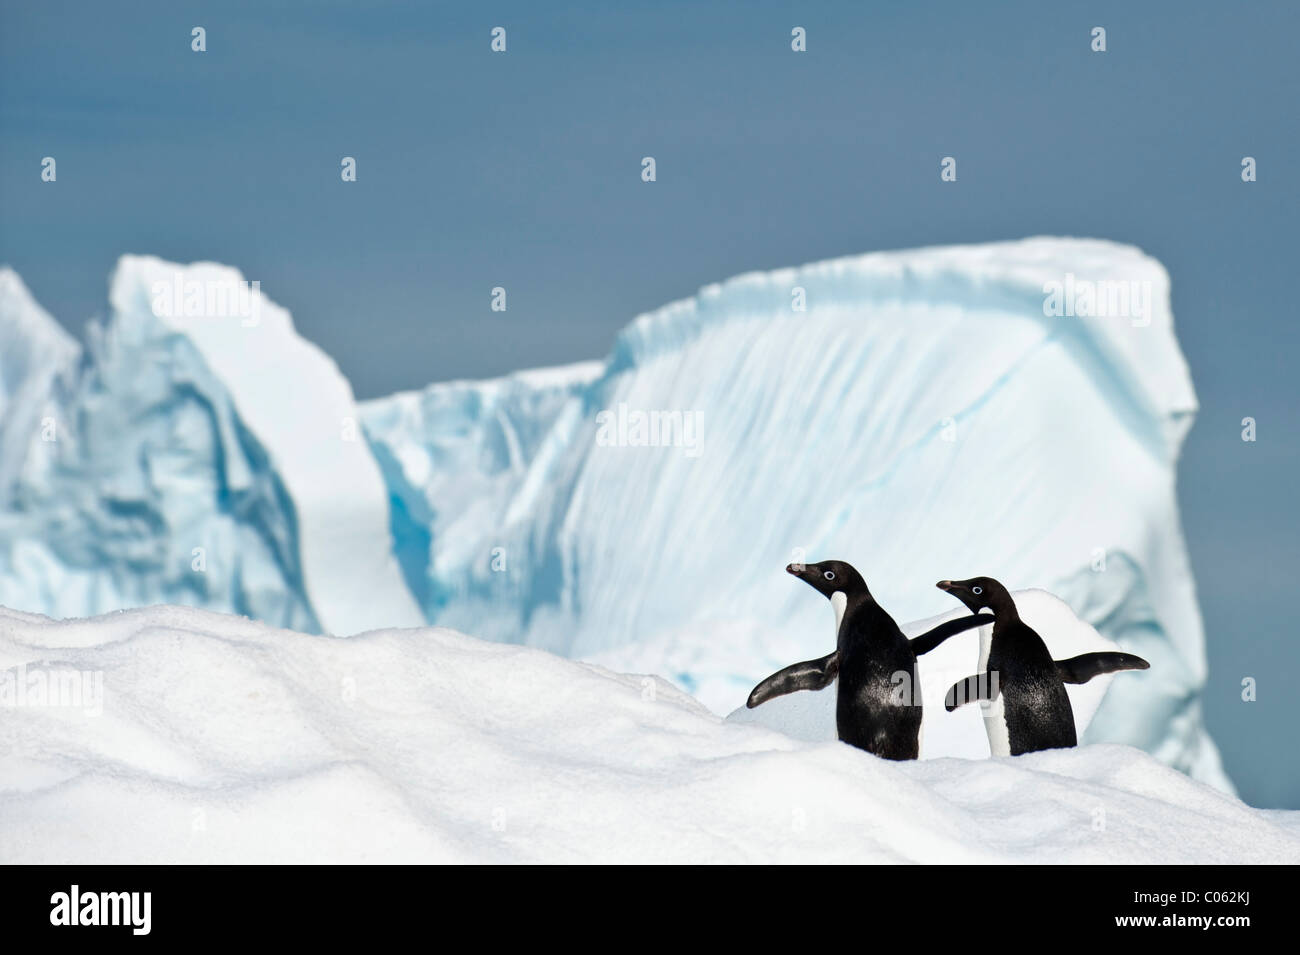 Adelie-Pinguine (Pygoscelis Adeliae) auf Eisberg. Yalour Inseln, antarktische Halbinsel, Antarktis. Stockbild